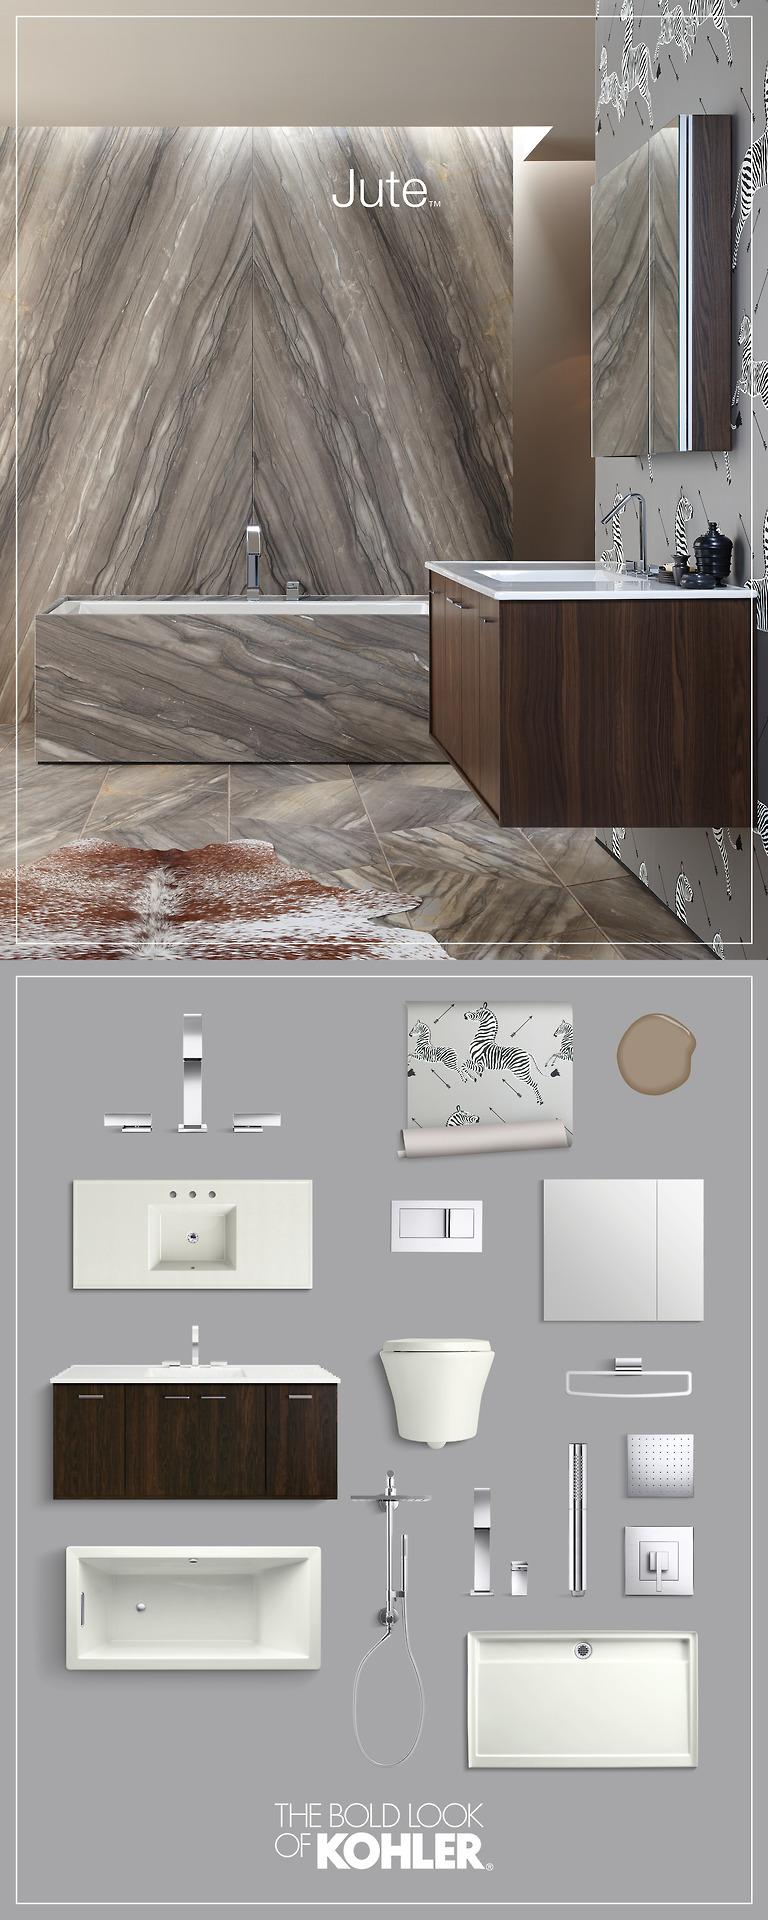 Kohler Bathroom Design Ideas ~ Bathroom ideas kohler stellar interior design